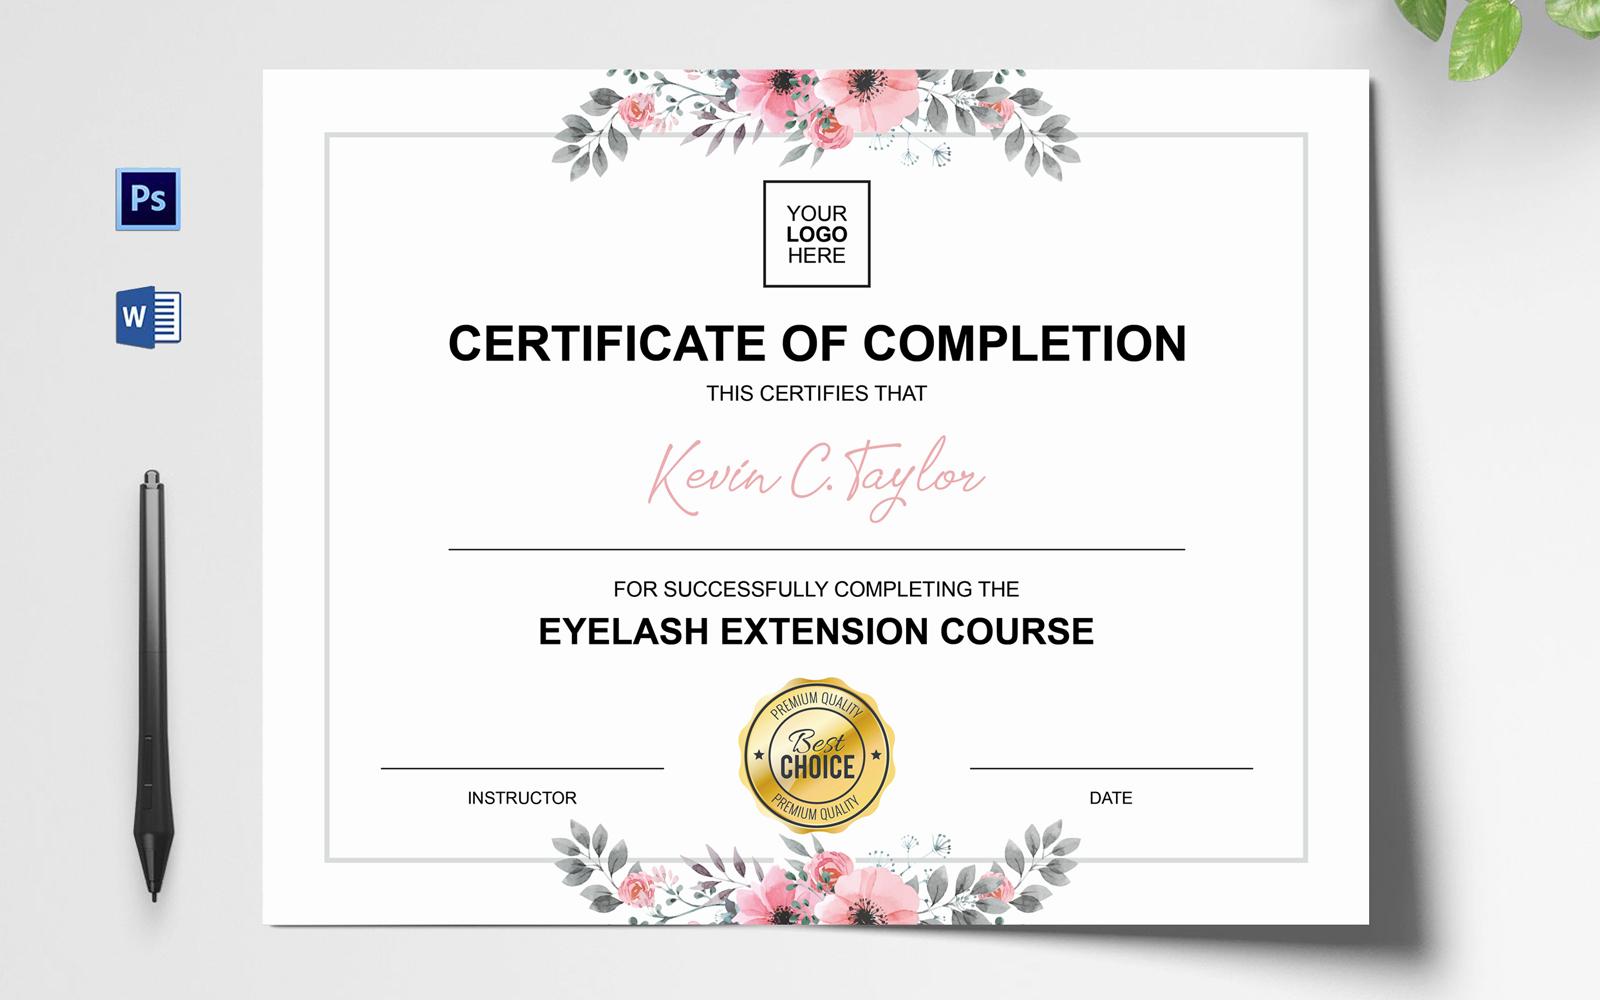 Szablon certyfikatu Rose Gold Eyelash Extension #151764